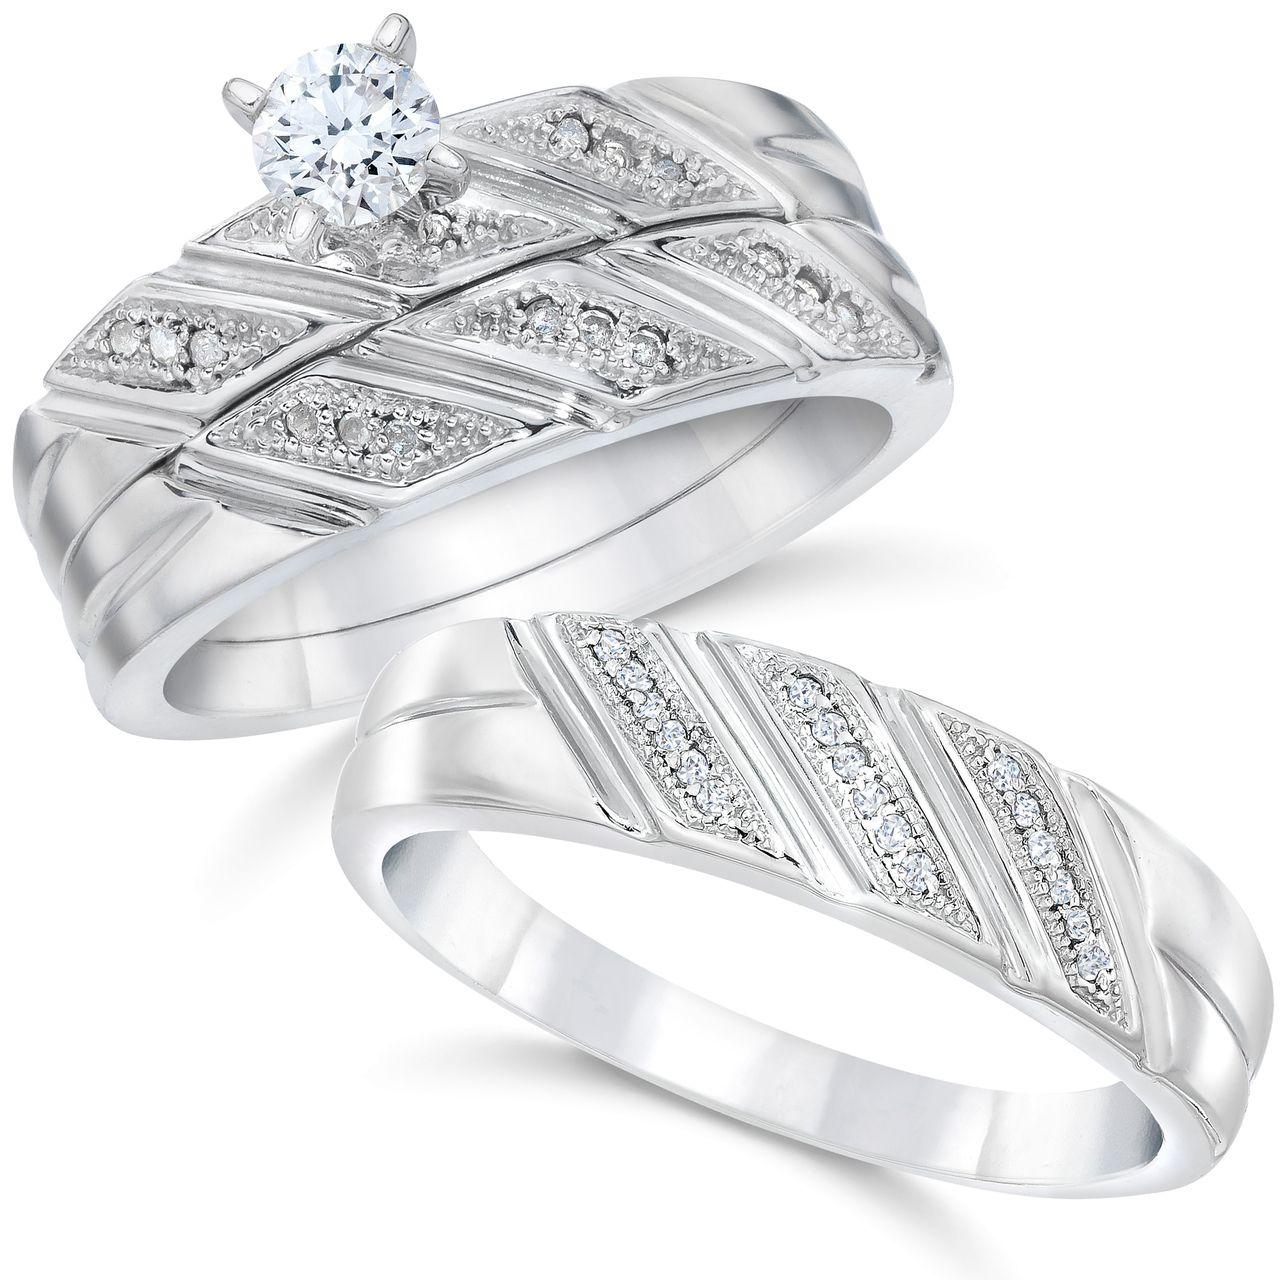 1/3ct His & Hers Diamond Trio Engagement Wedding Ring Set